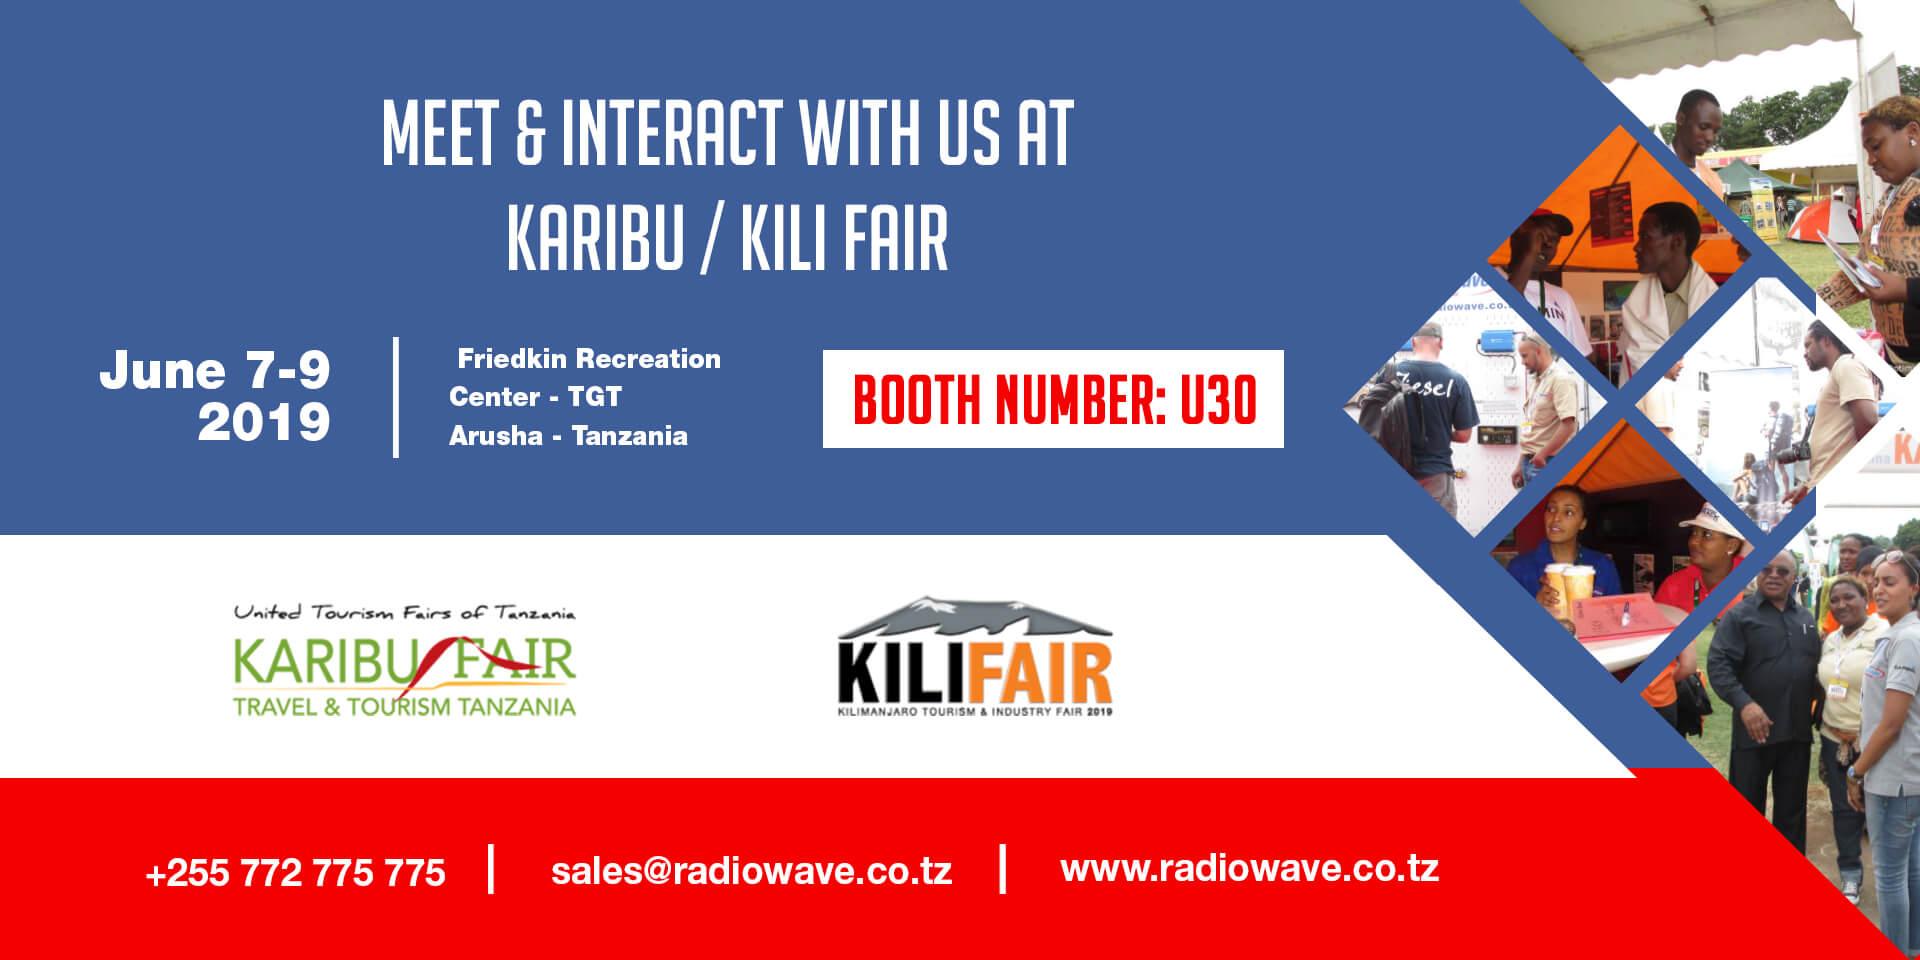 web-banner-rwcl-kilifair-karibu-2019